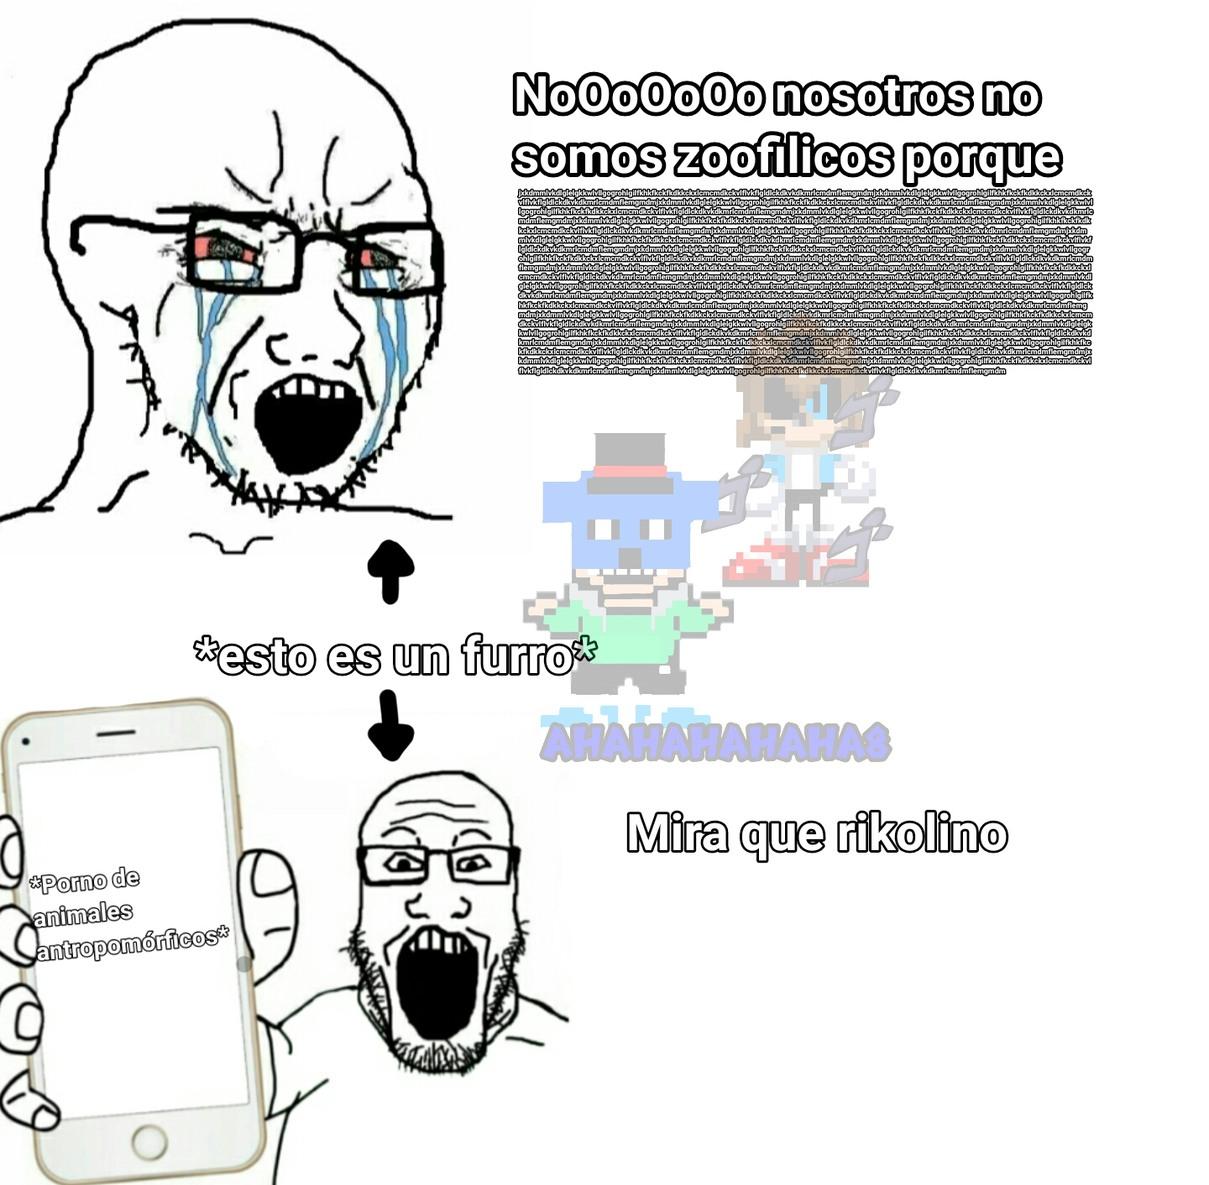 Furros qliaos hipócritas - meme